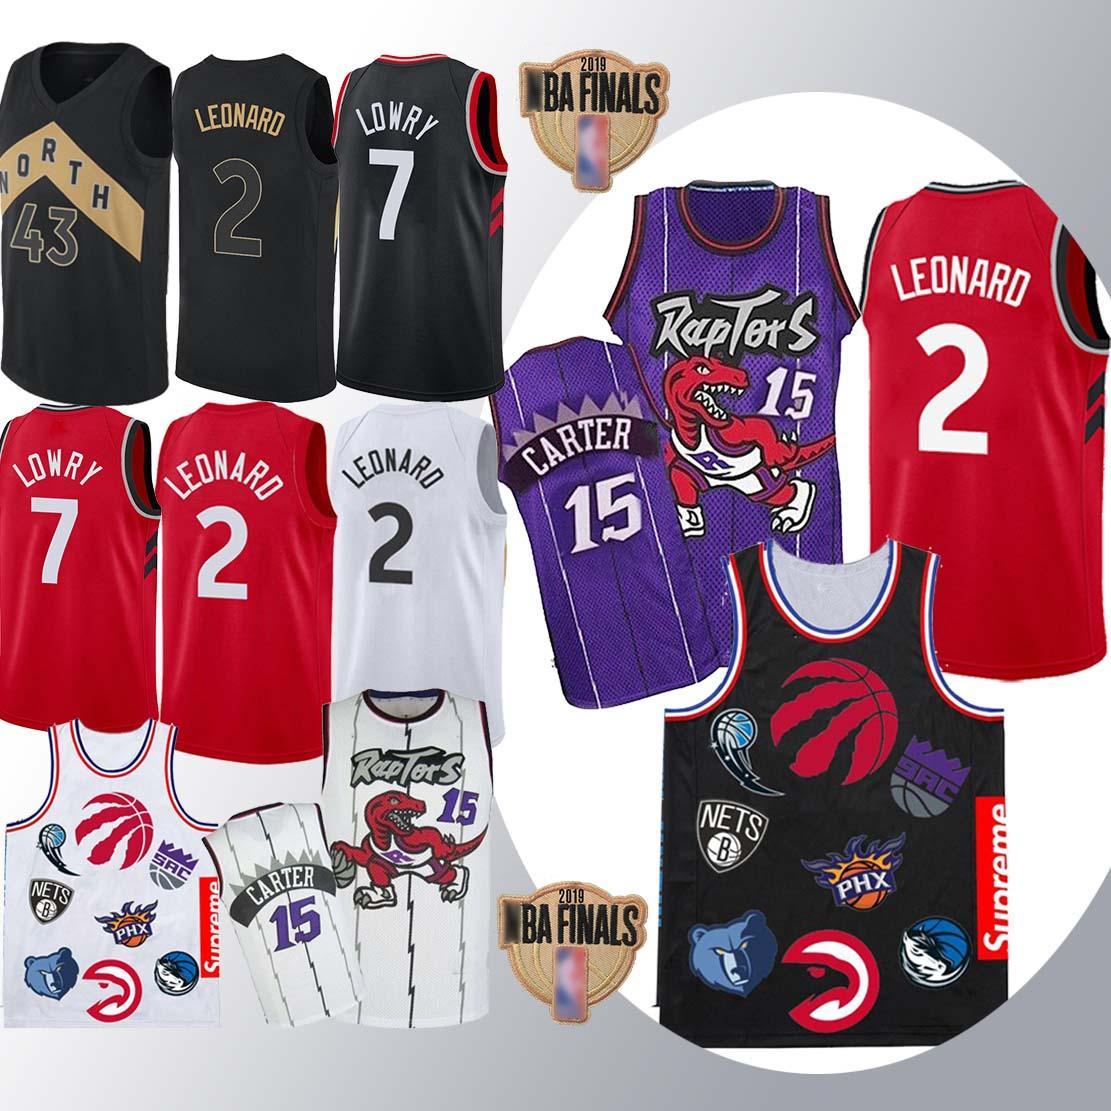 separation shoes f7cc4 df019 7 Lowry 2 Leonard Toronto Jersey Raptors 10 DeRozan jersey 18/19 men  Basketball Jerseys superior quality Top MEN shirt 2019 Design sweater